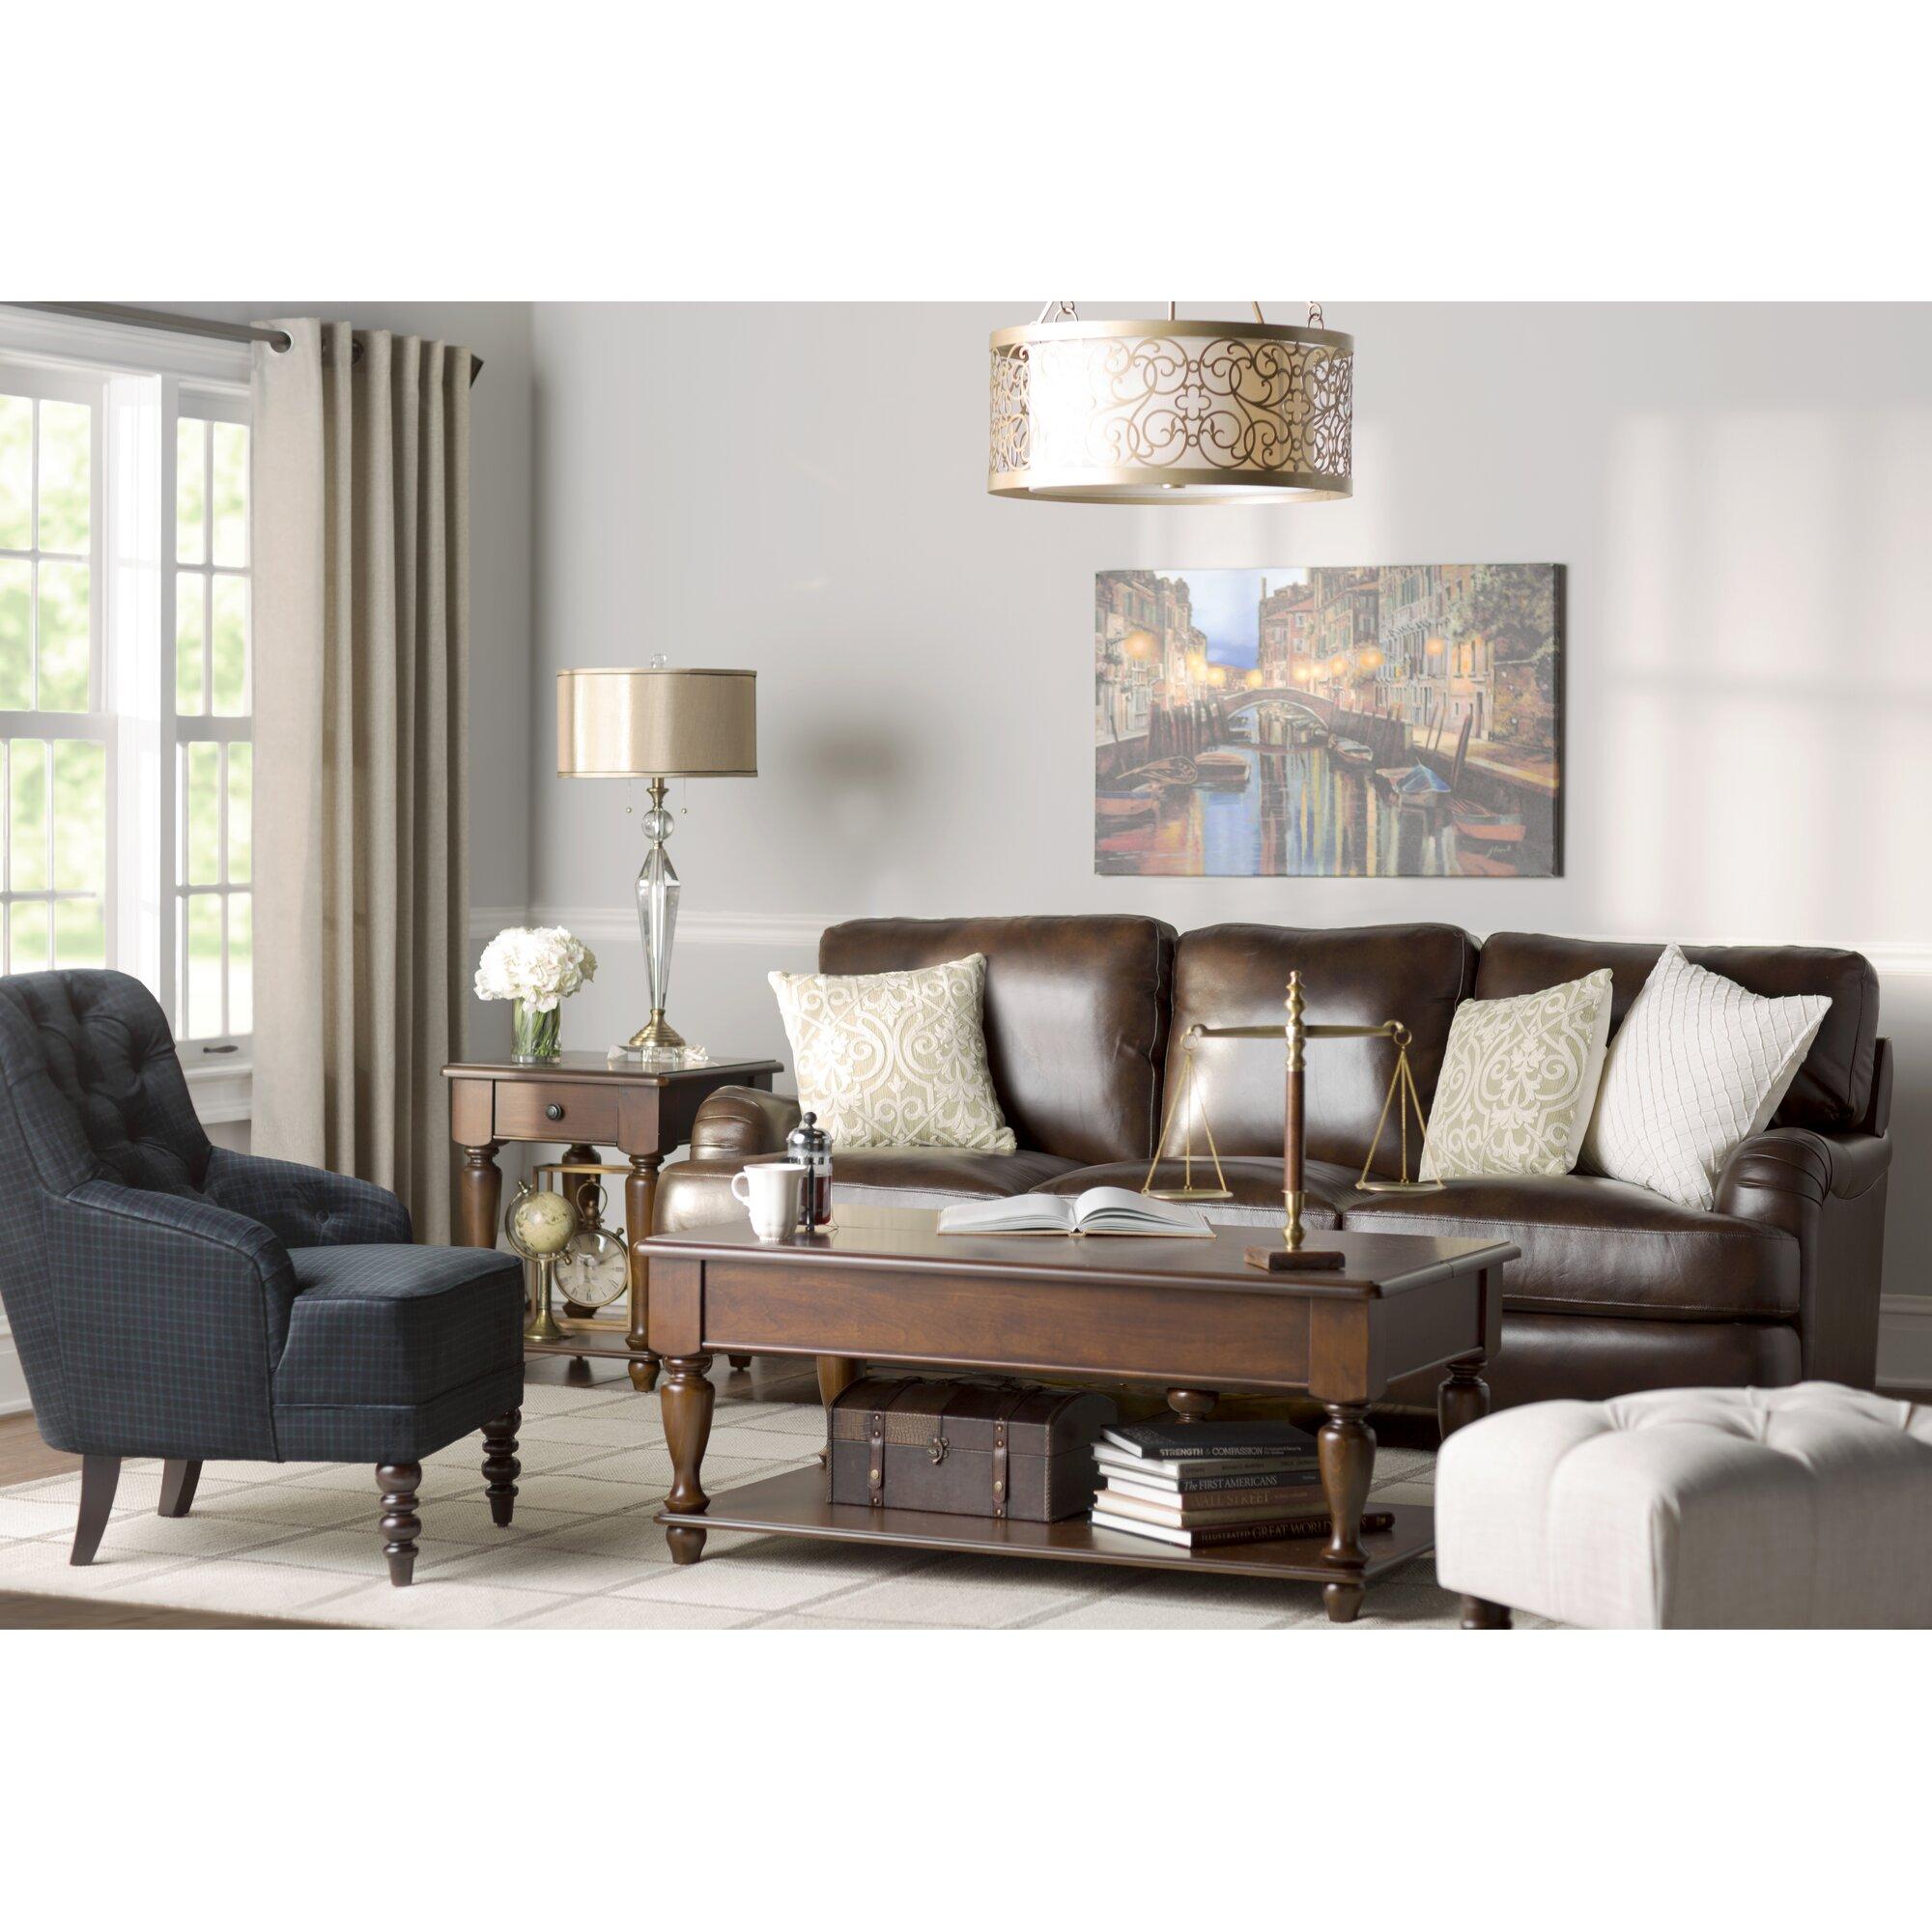 Willa arlo interiors semple table lamp reviews - Willa arlo interiors keeley bar cart ...